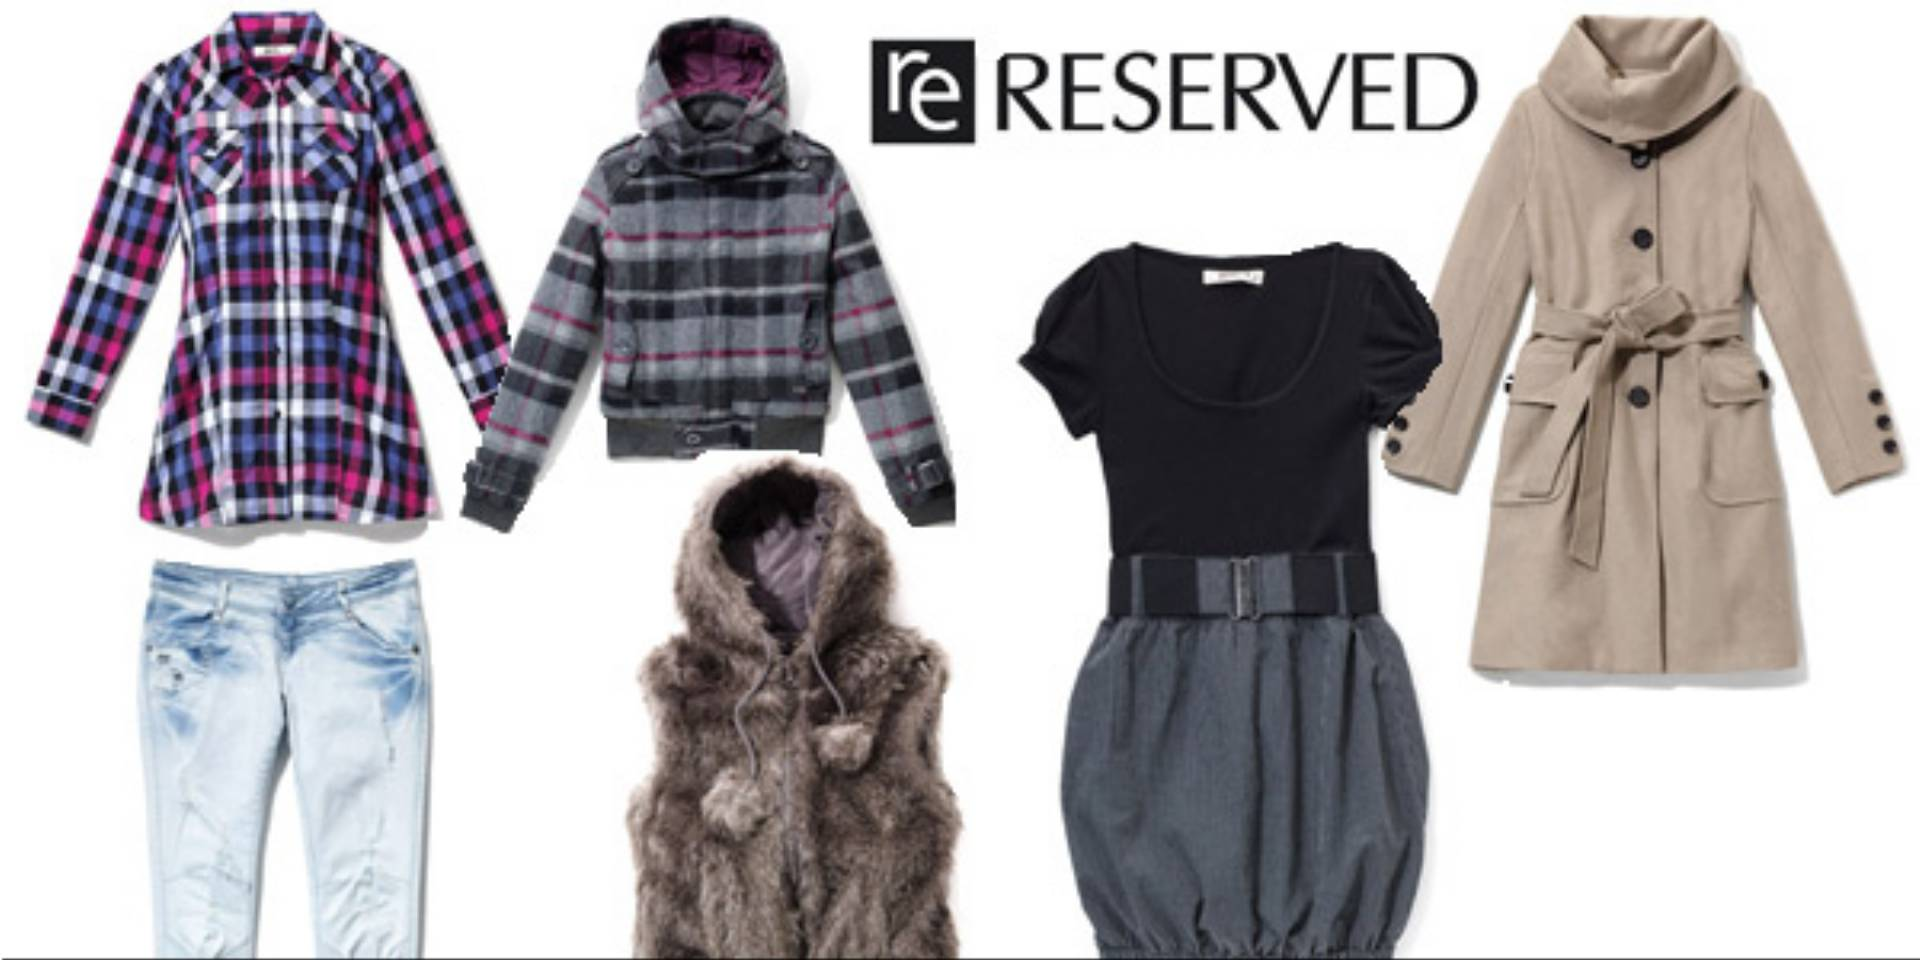 Kolekcja RESERVED na jesień i zimę 2010/2011